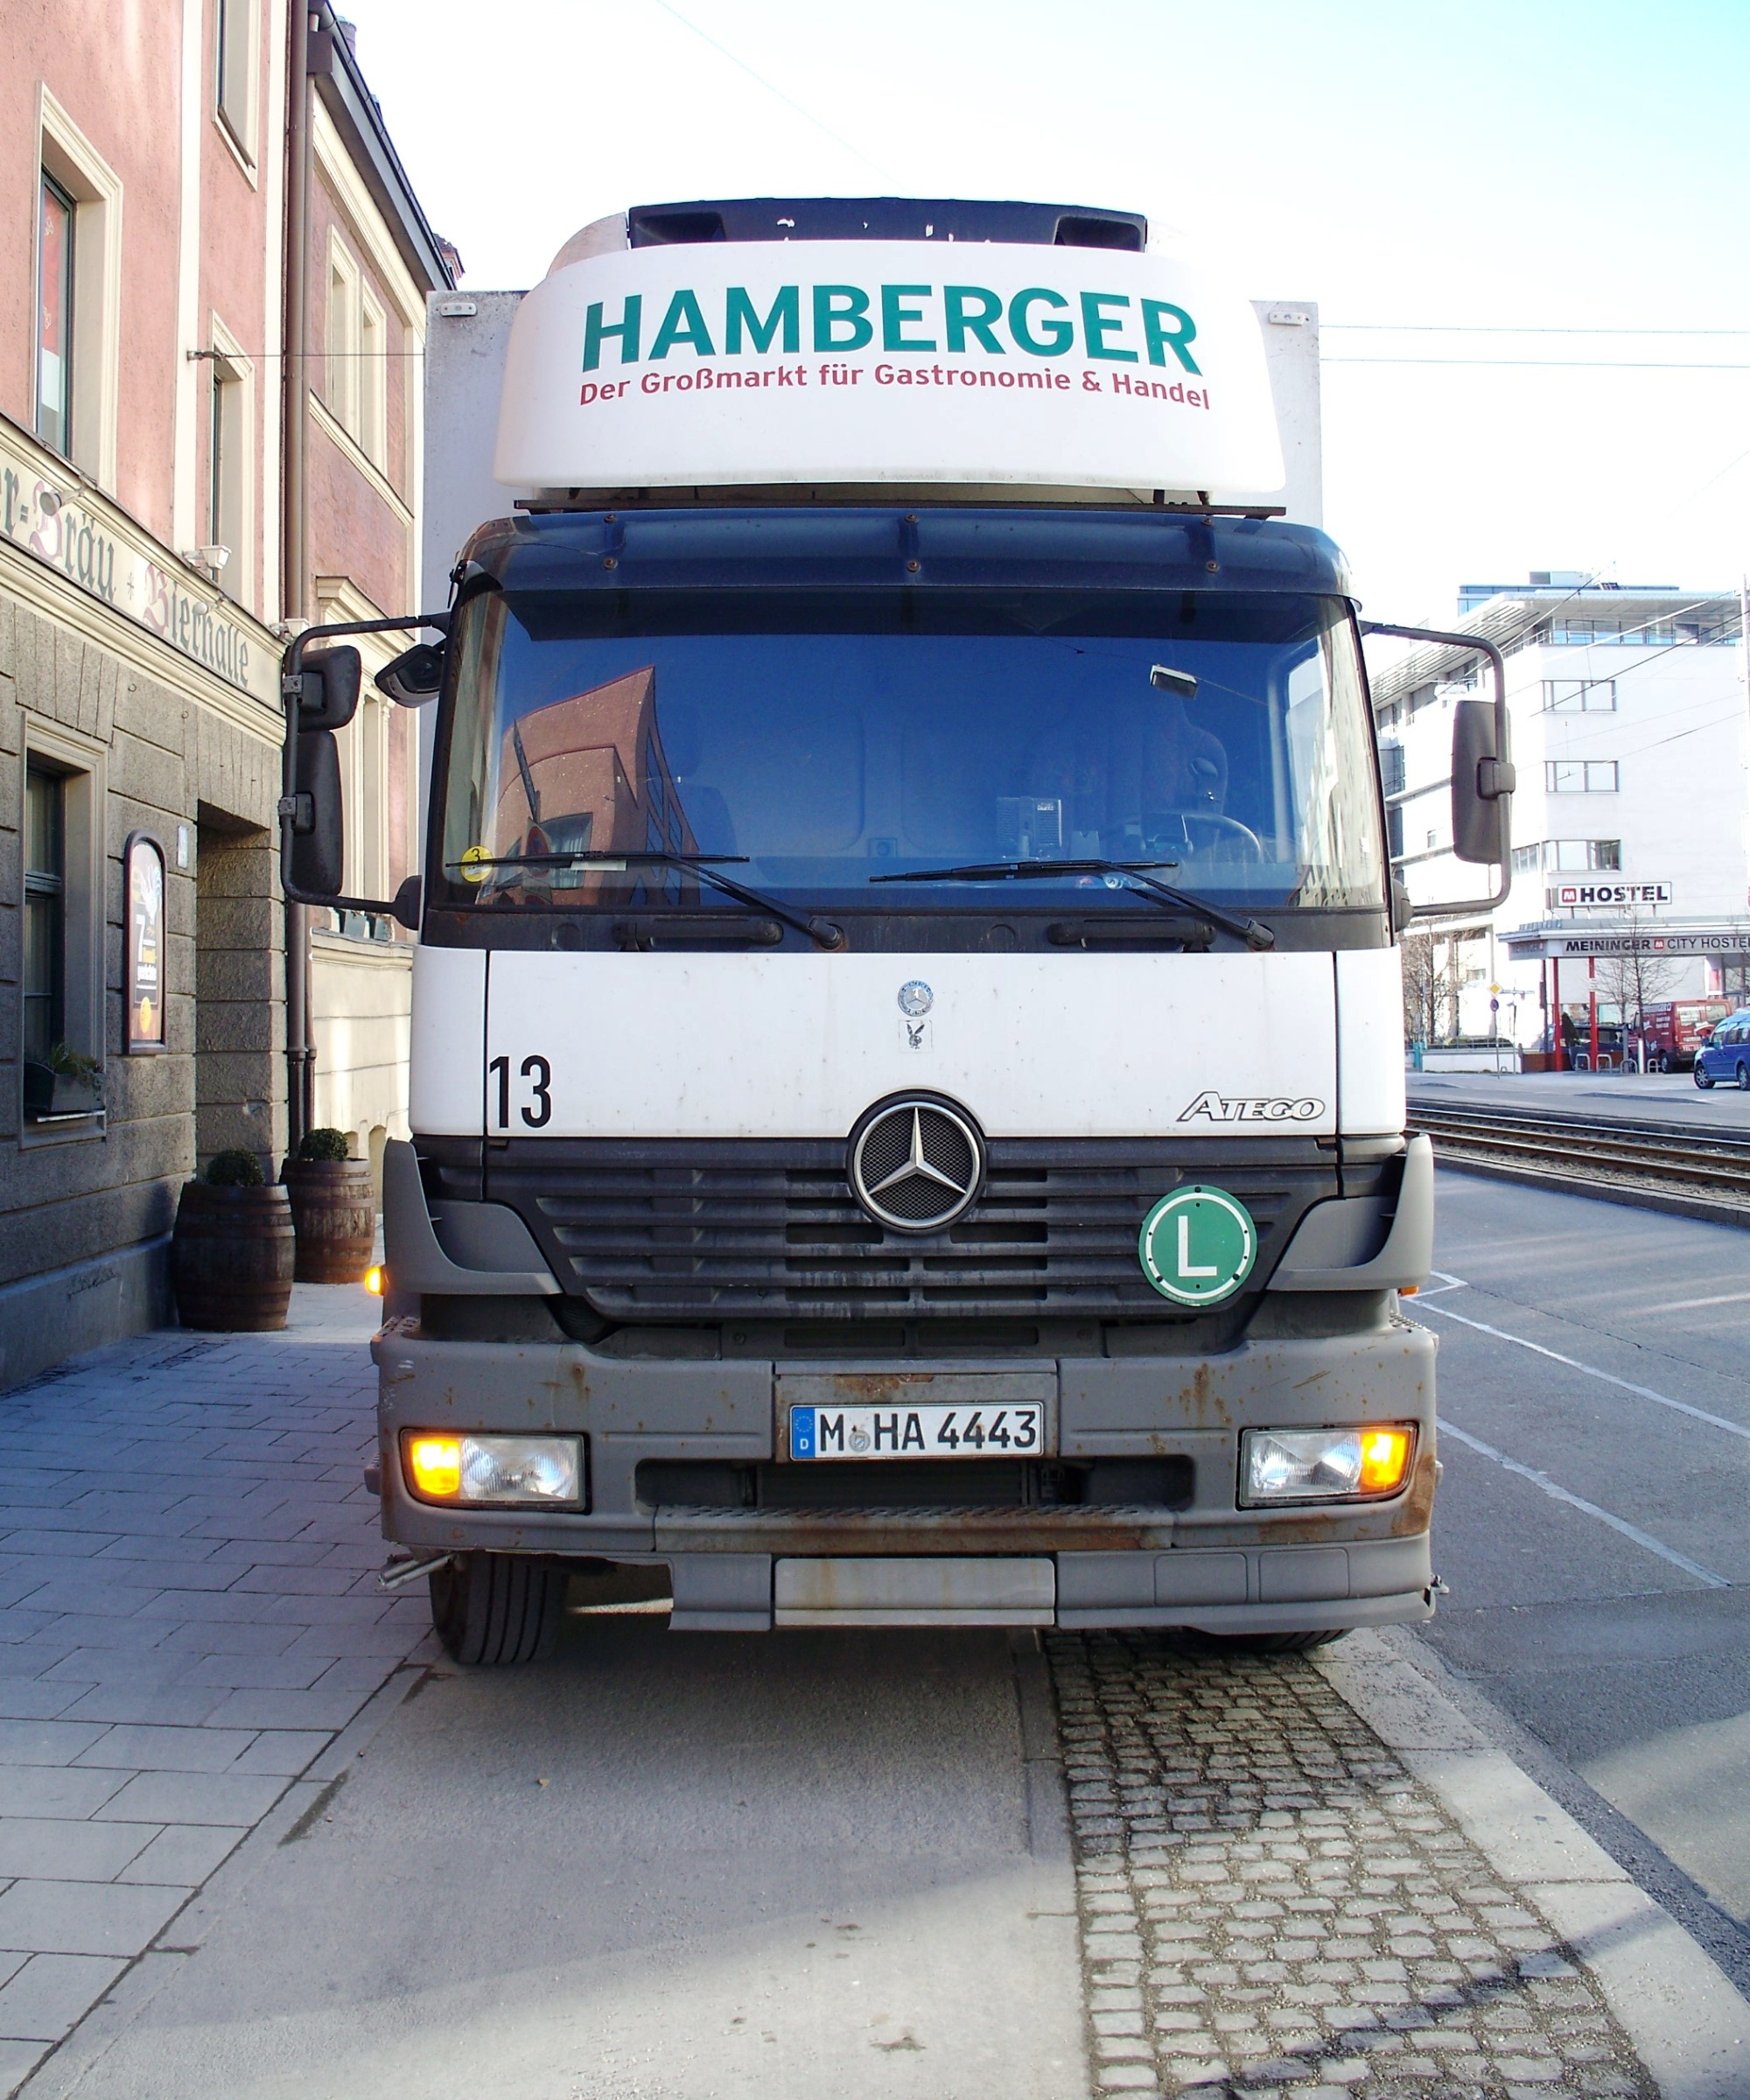 File:Mercedes-Benz Atego truck.JPG - Wikimedia Commons